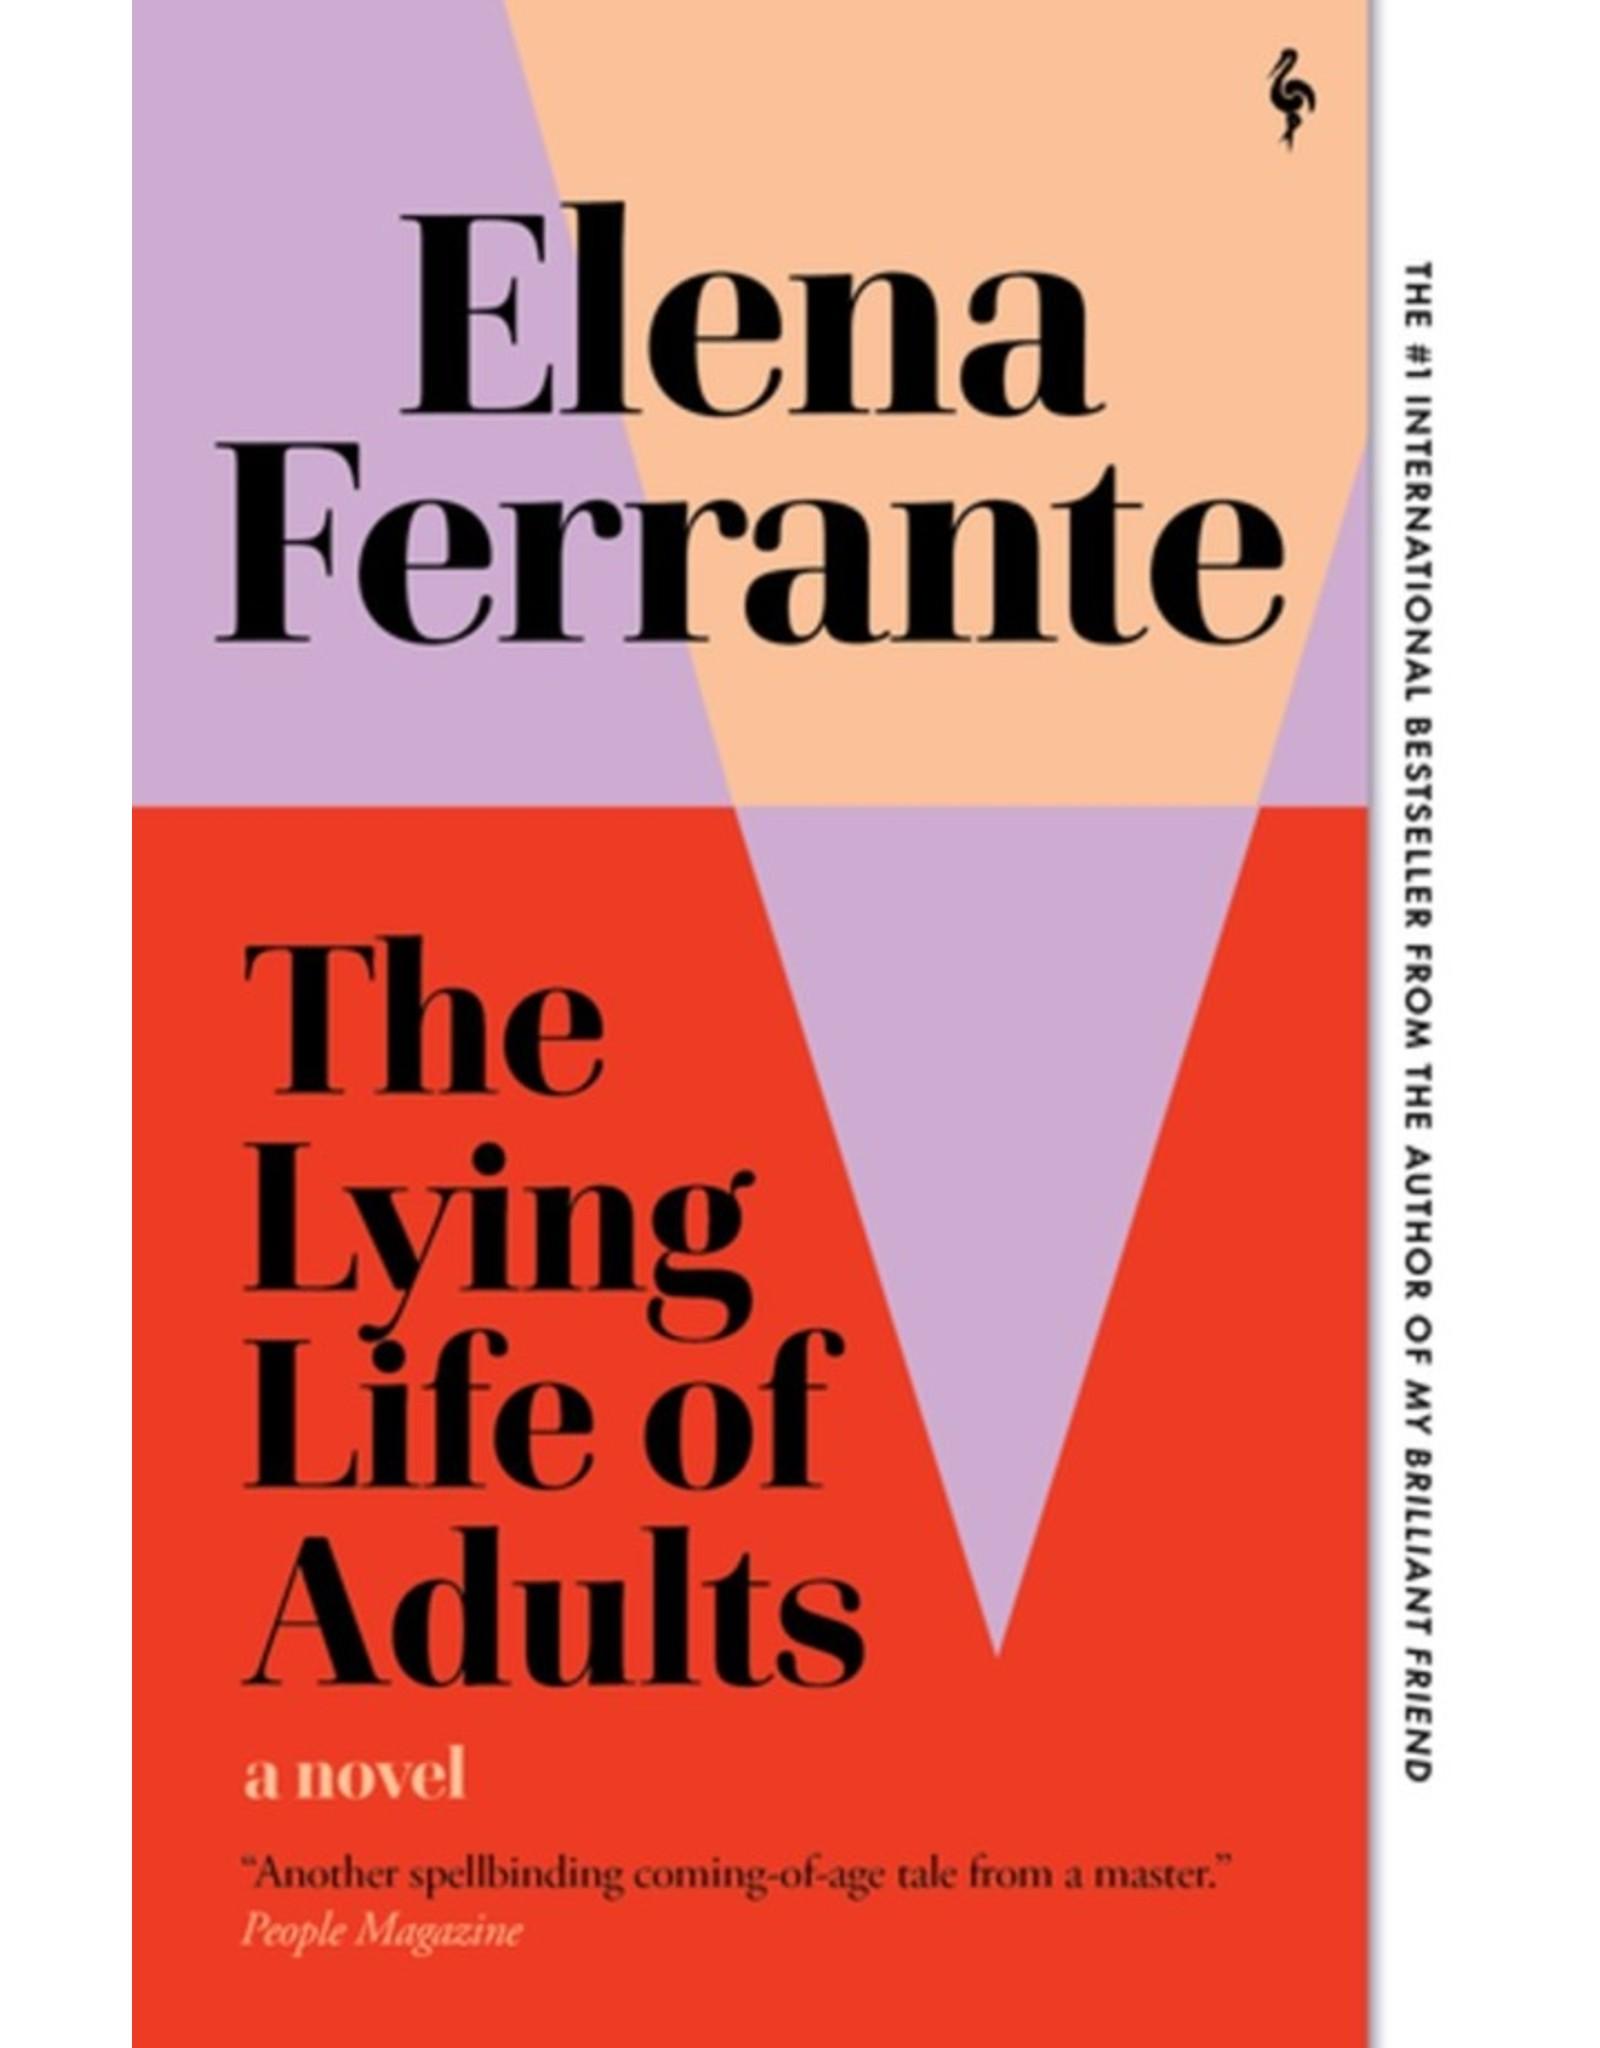 Books The Lying Life of Adults : A Novel by Elena Ferrante